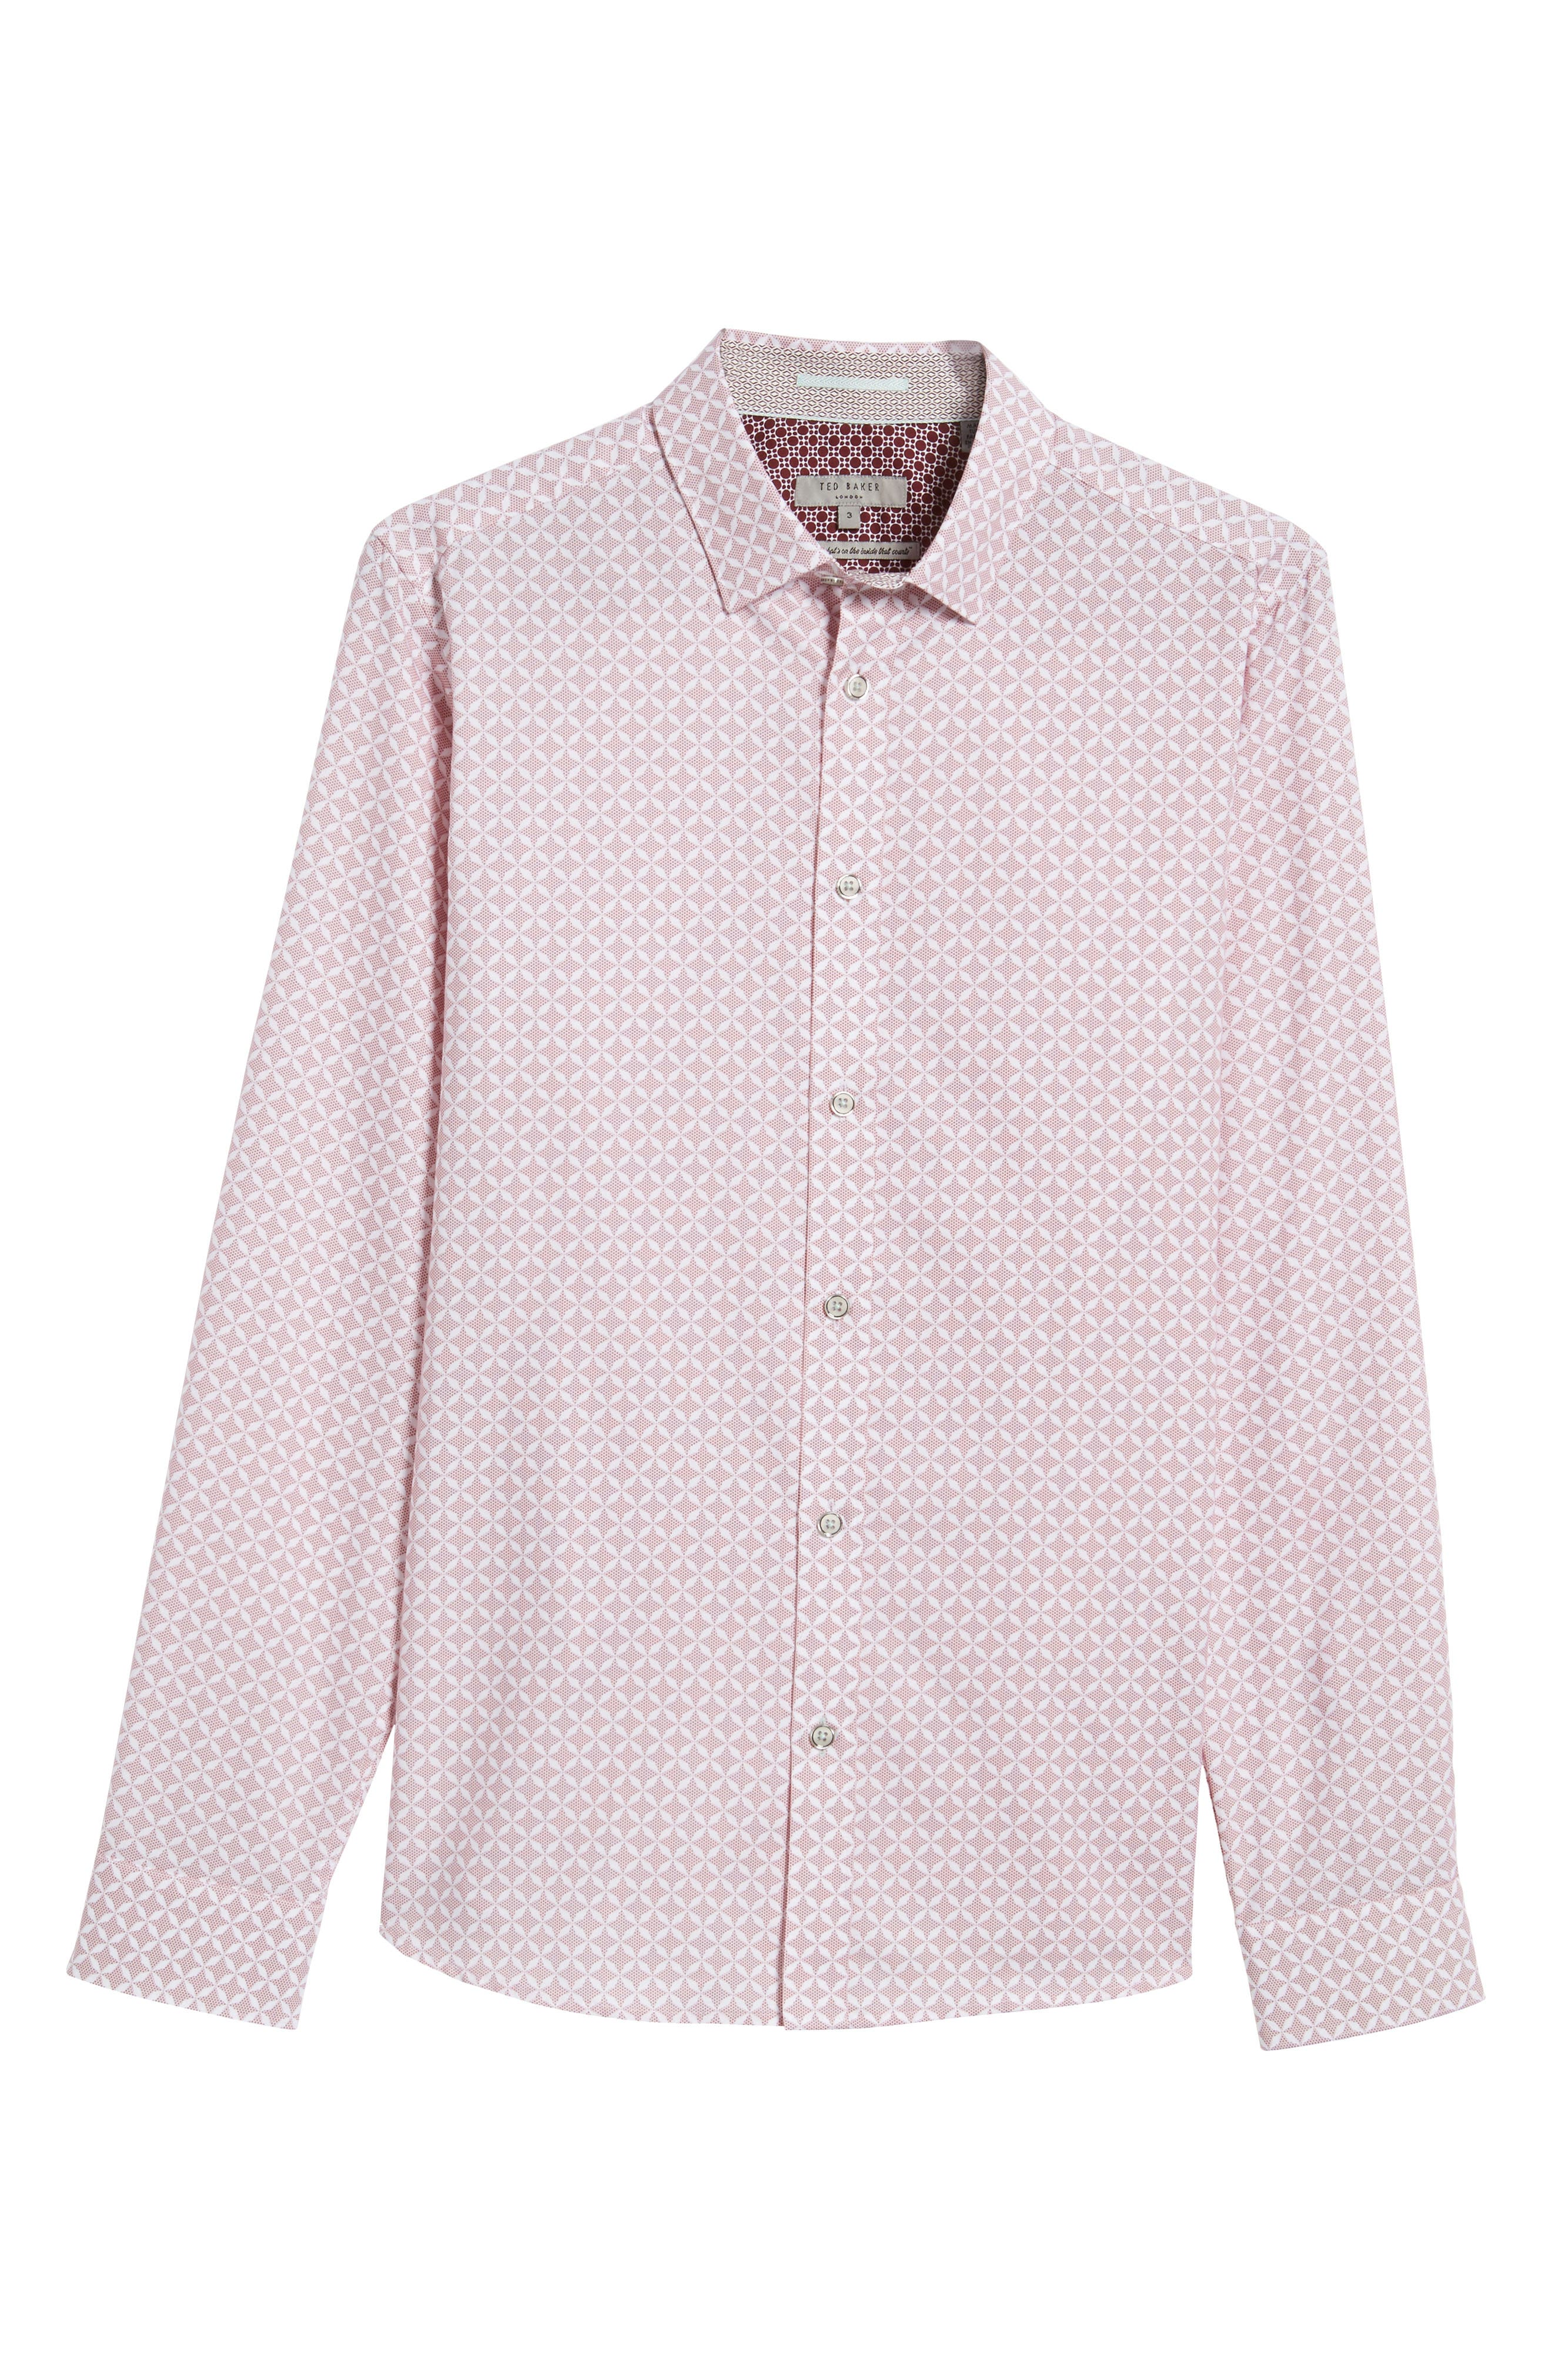 Langaz Dot Lattice Sport Shirt,                             Alternate thumbnail 5, color,                             Pink